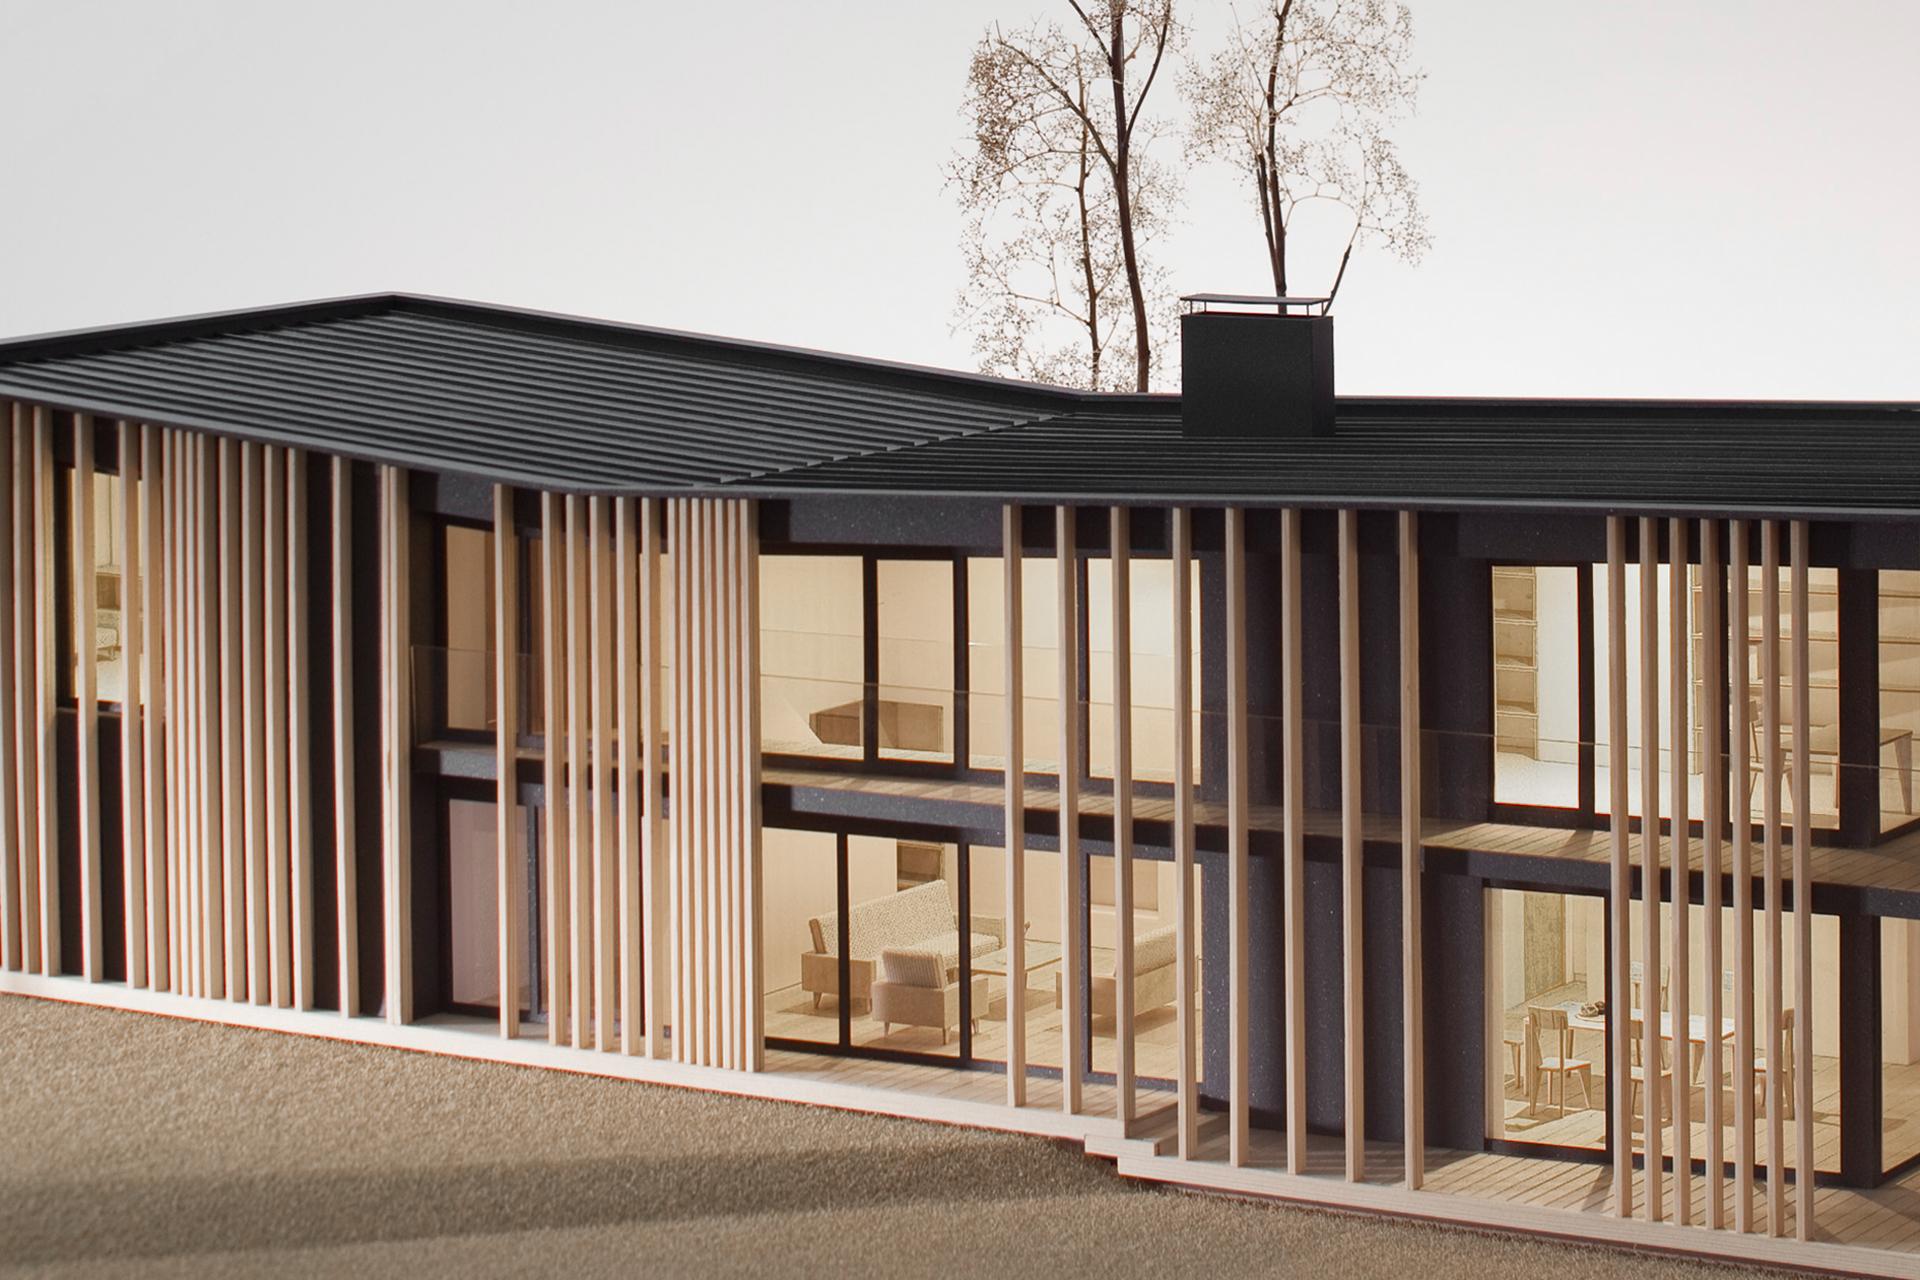 onimo-makiety-architektoniczne-PAG-shutter-07